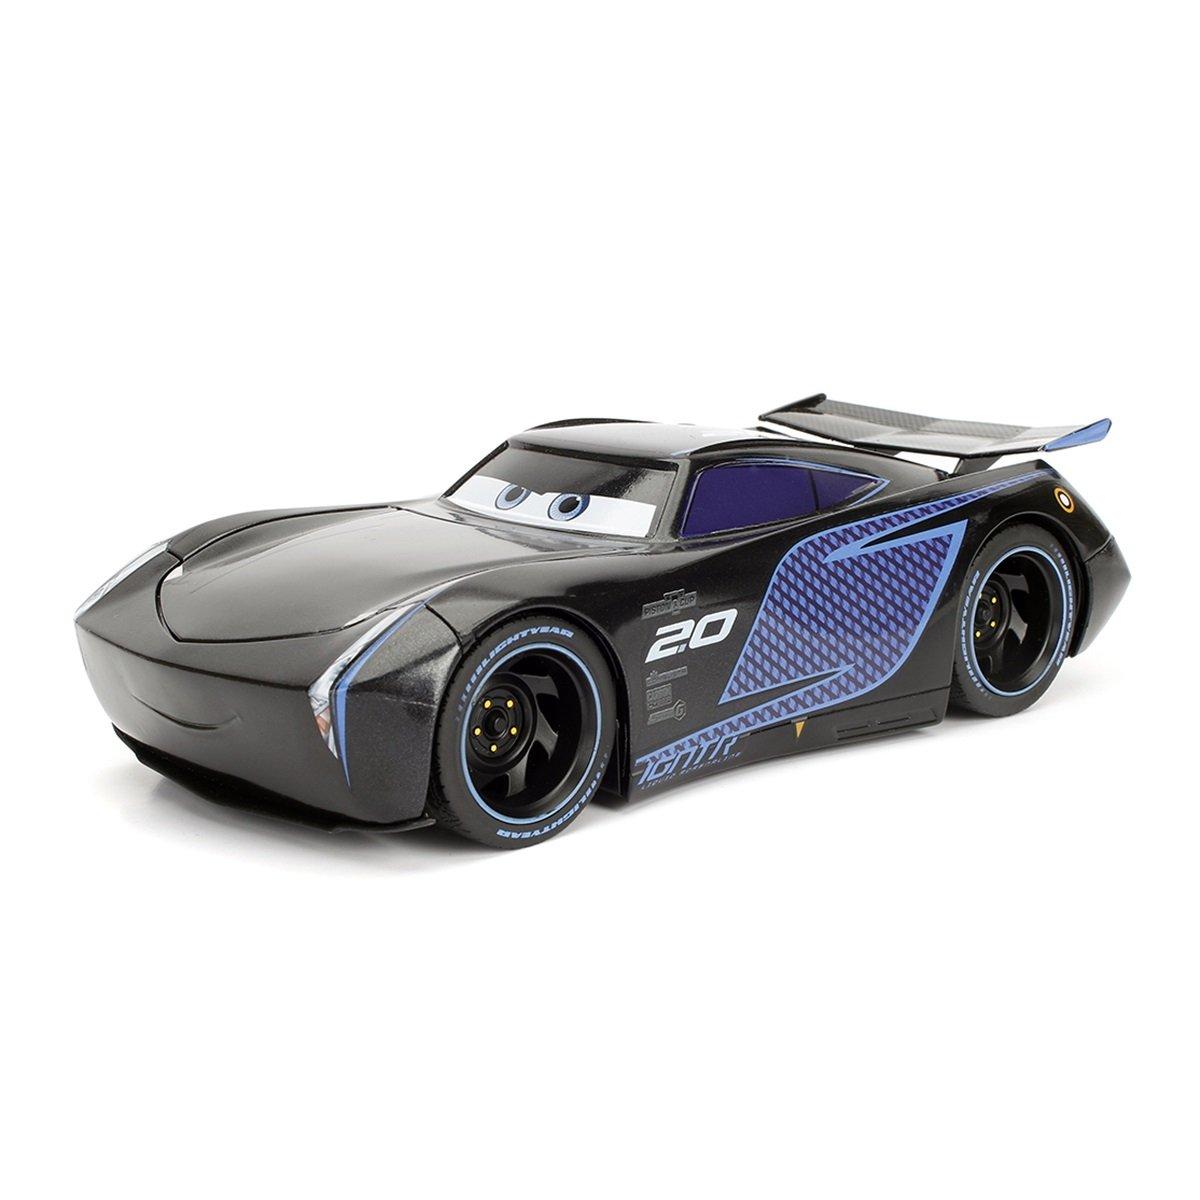 miniatura carro jackson storm disney pixar cars 3 1 24 jada. Black Bedroom Furniture Sets. Home Design Ideas